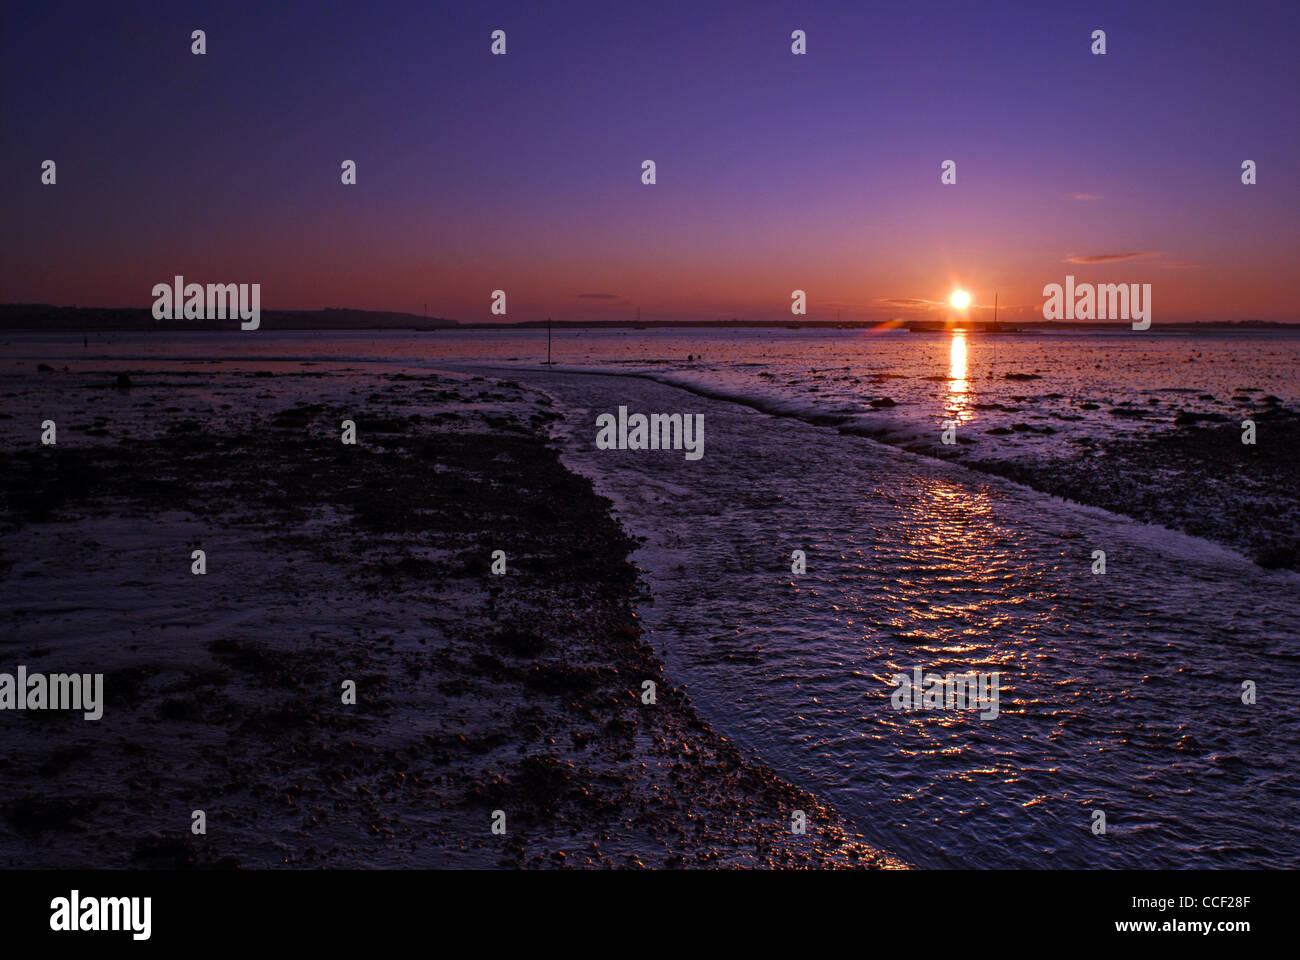 Sunrise over mudflats, Exe Estuary near Cockwood Harbour. Devon, England. - Stock Image